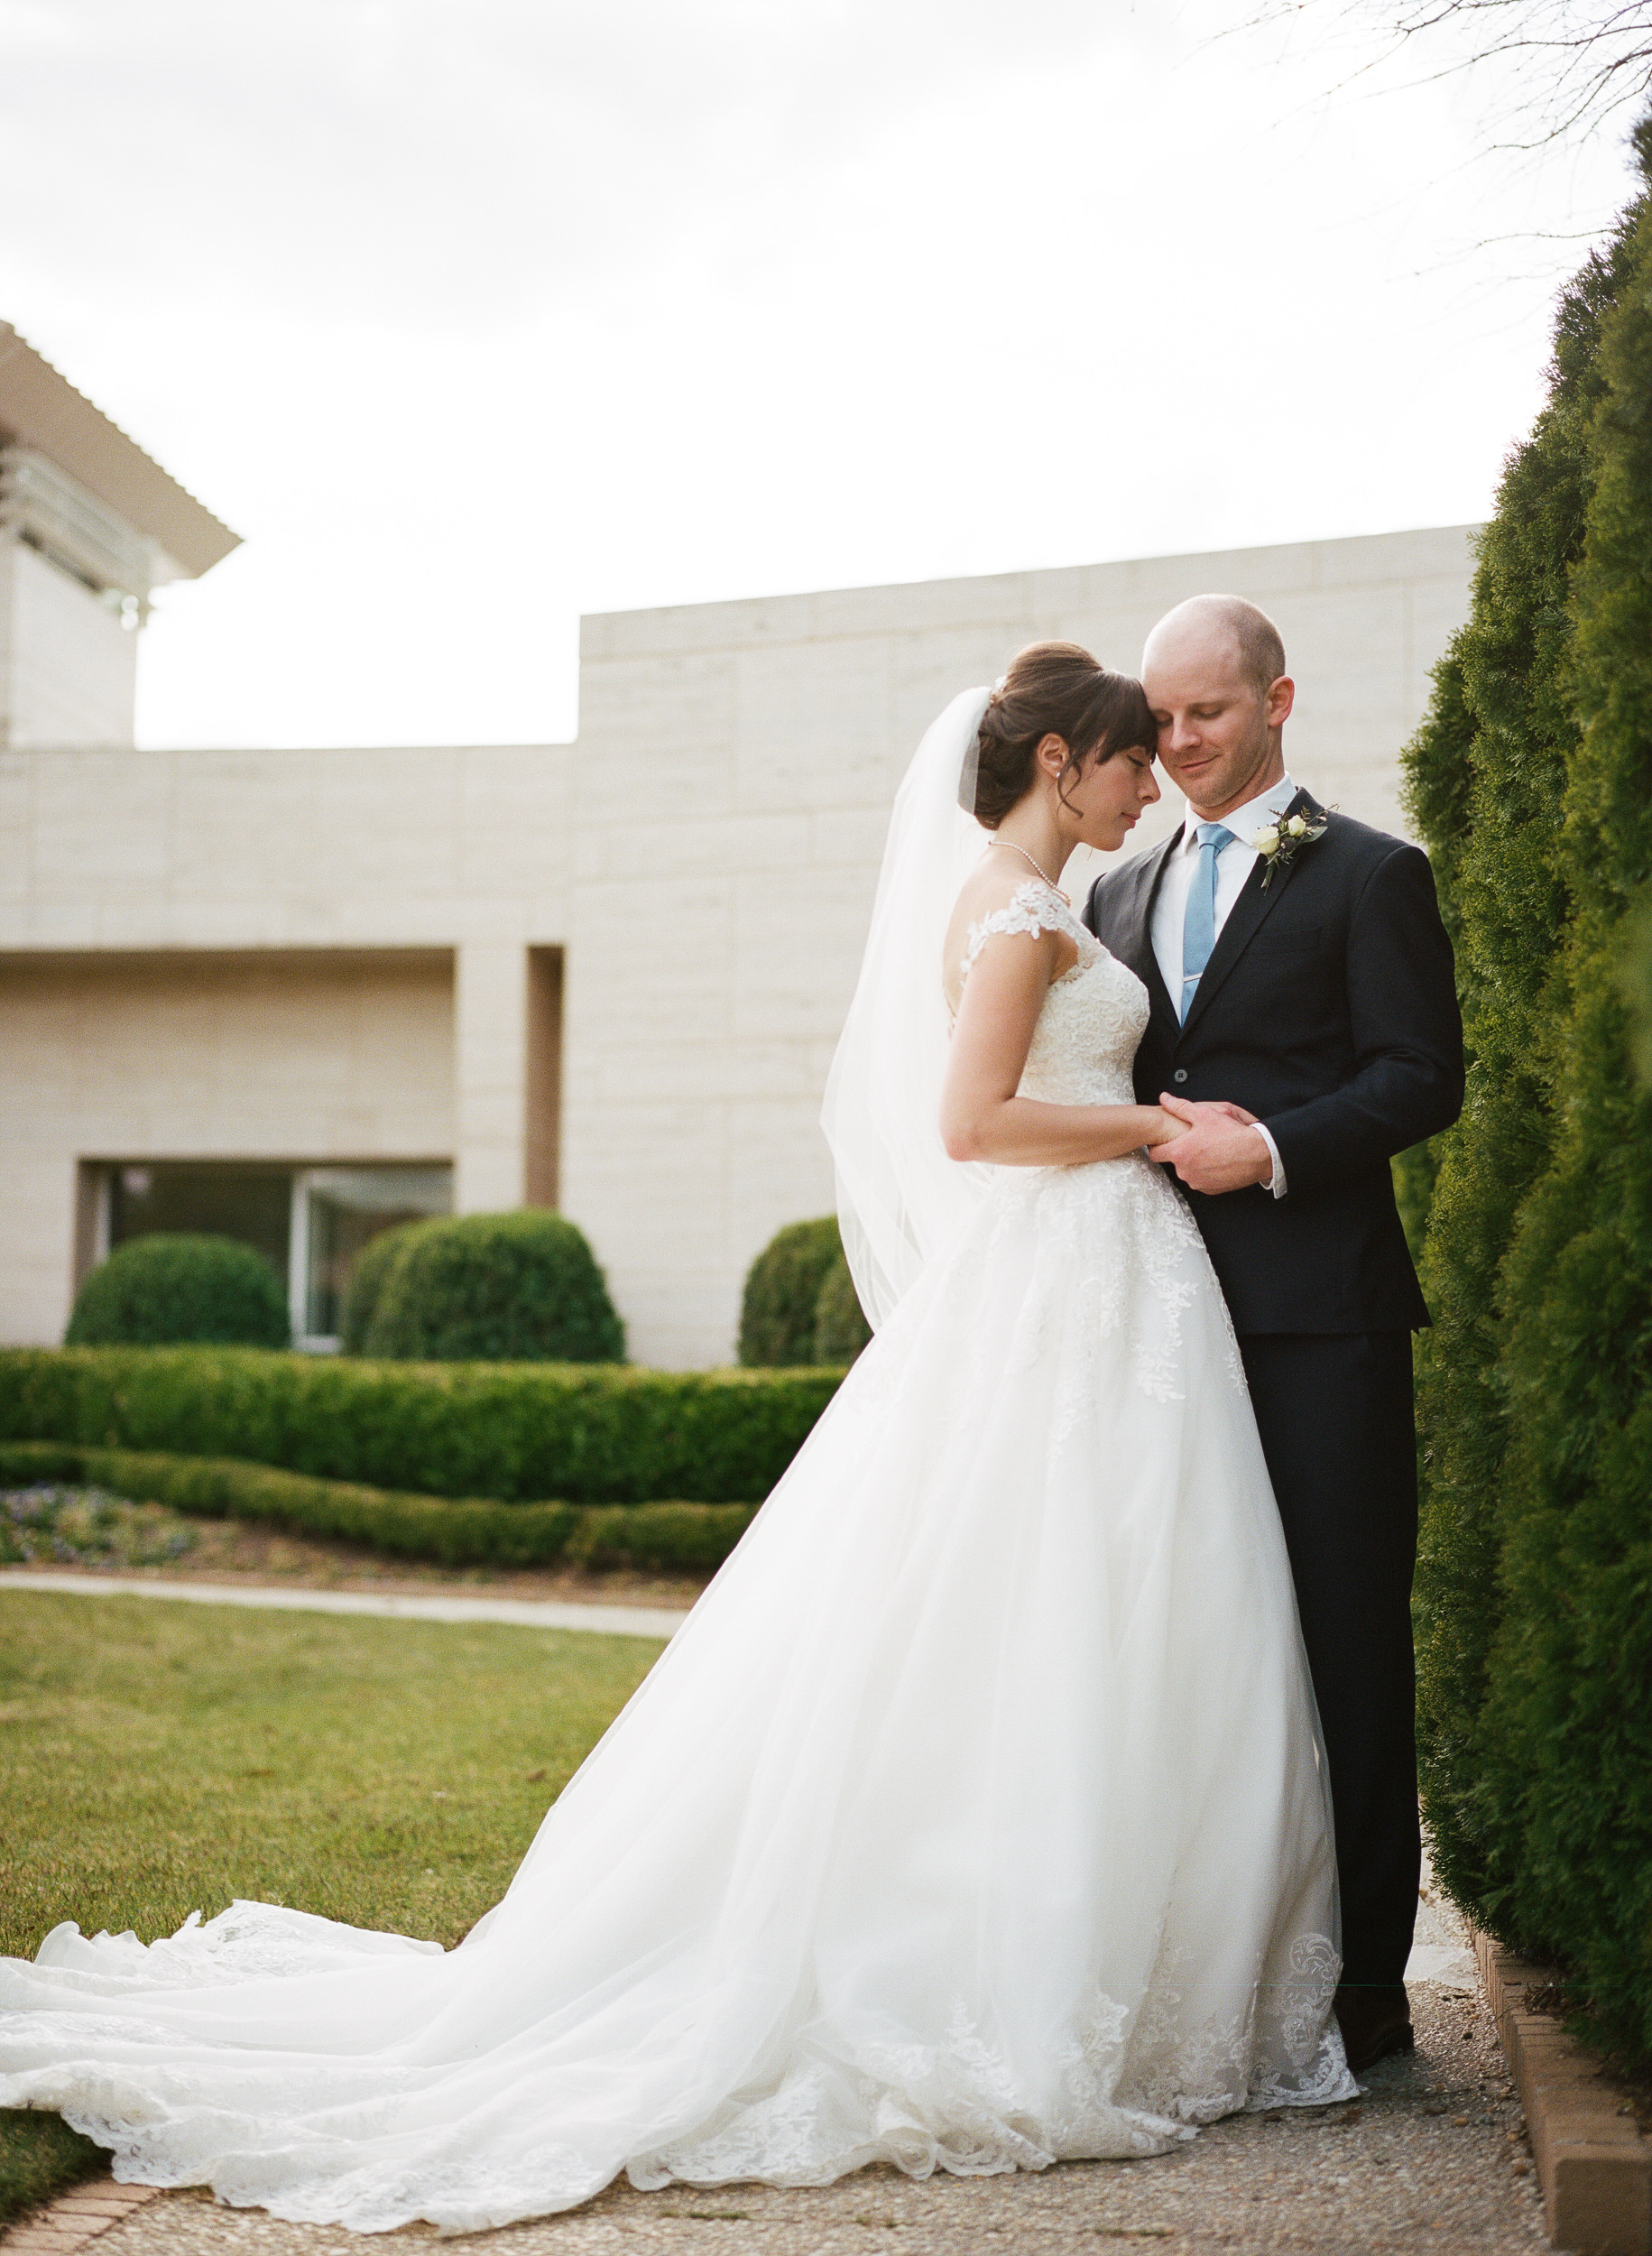 AB_Auburn_Wedding_2019-00056.jpg